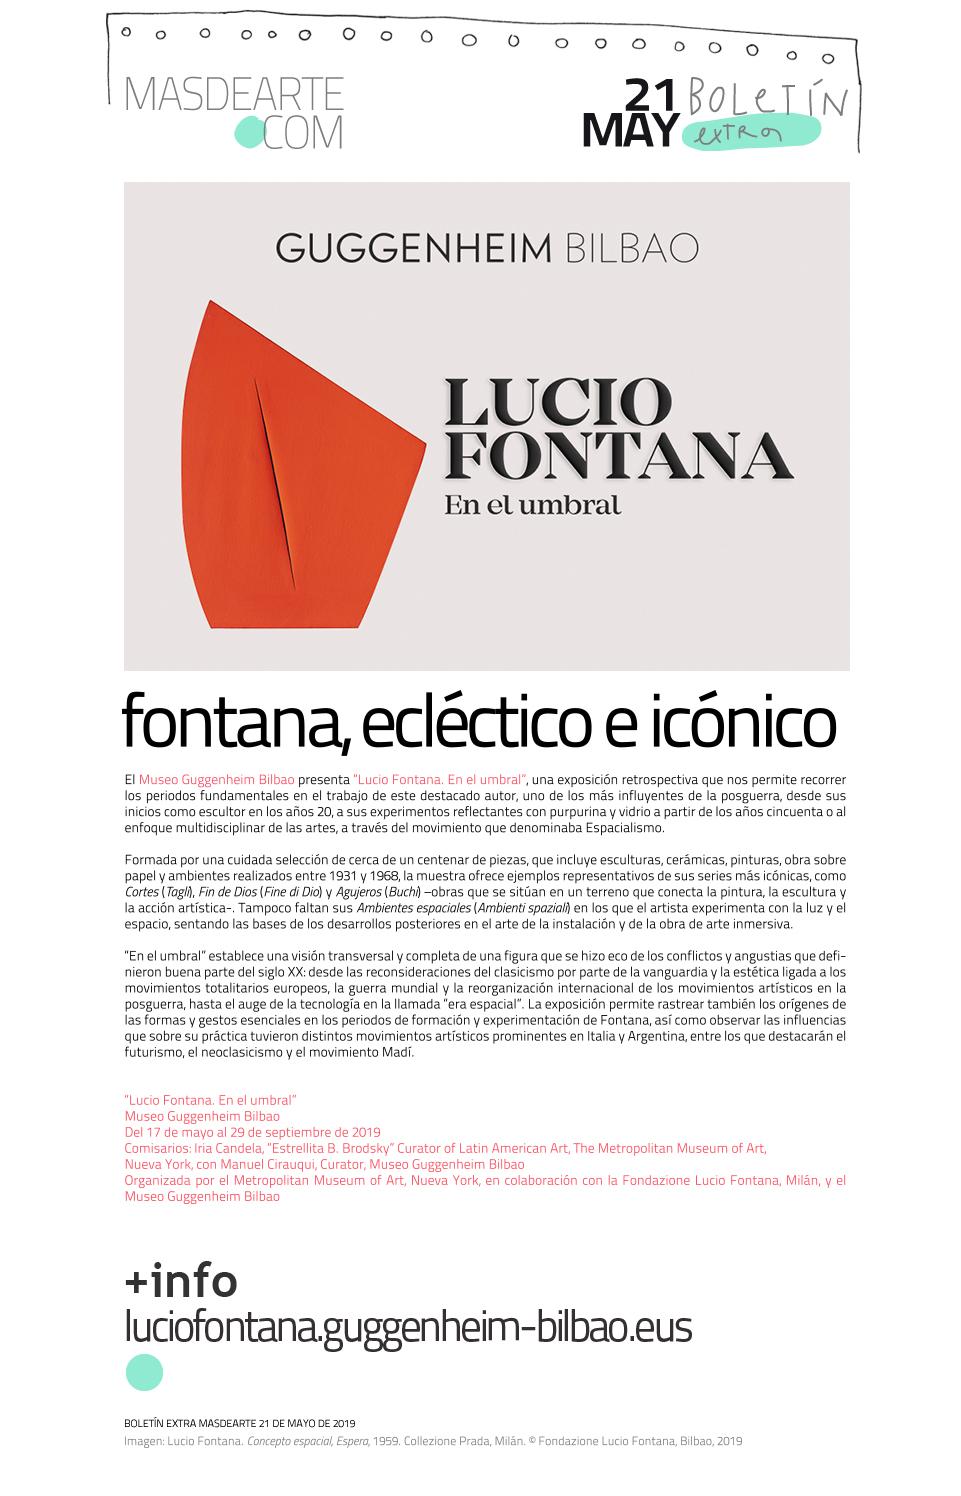 Extra masdearte: Lucio Fontana, retrospectiva en el Museo Guggenheim Bilbao